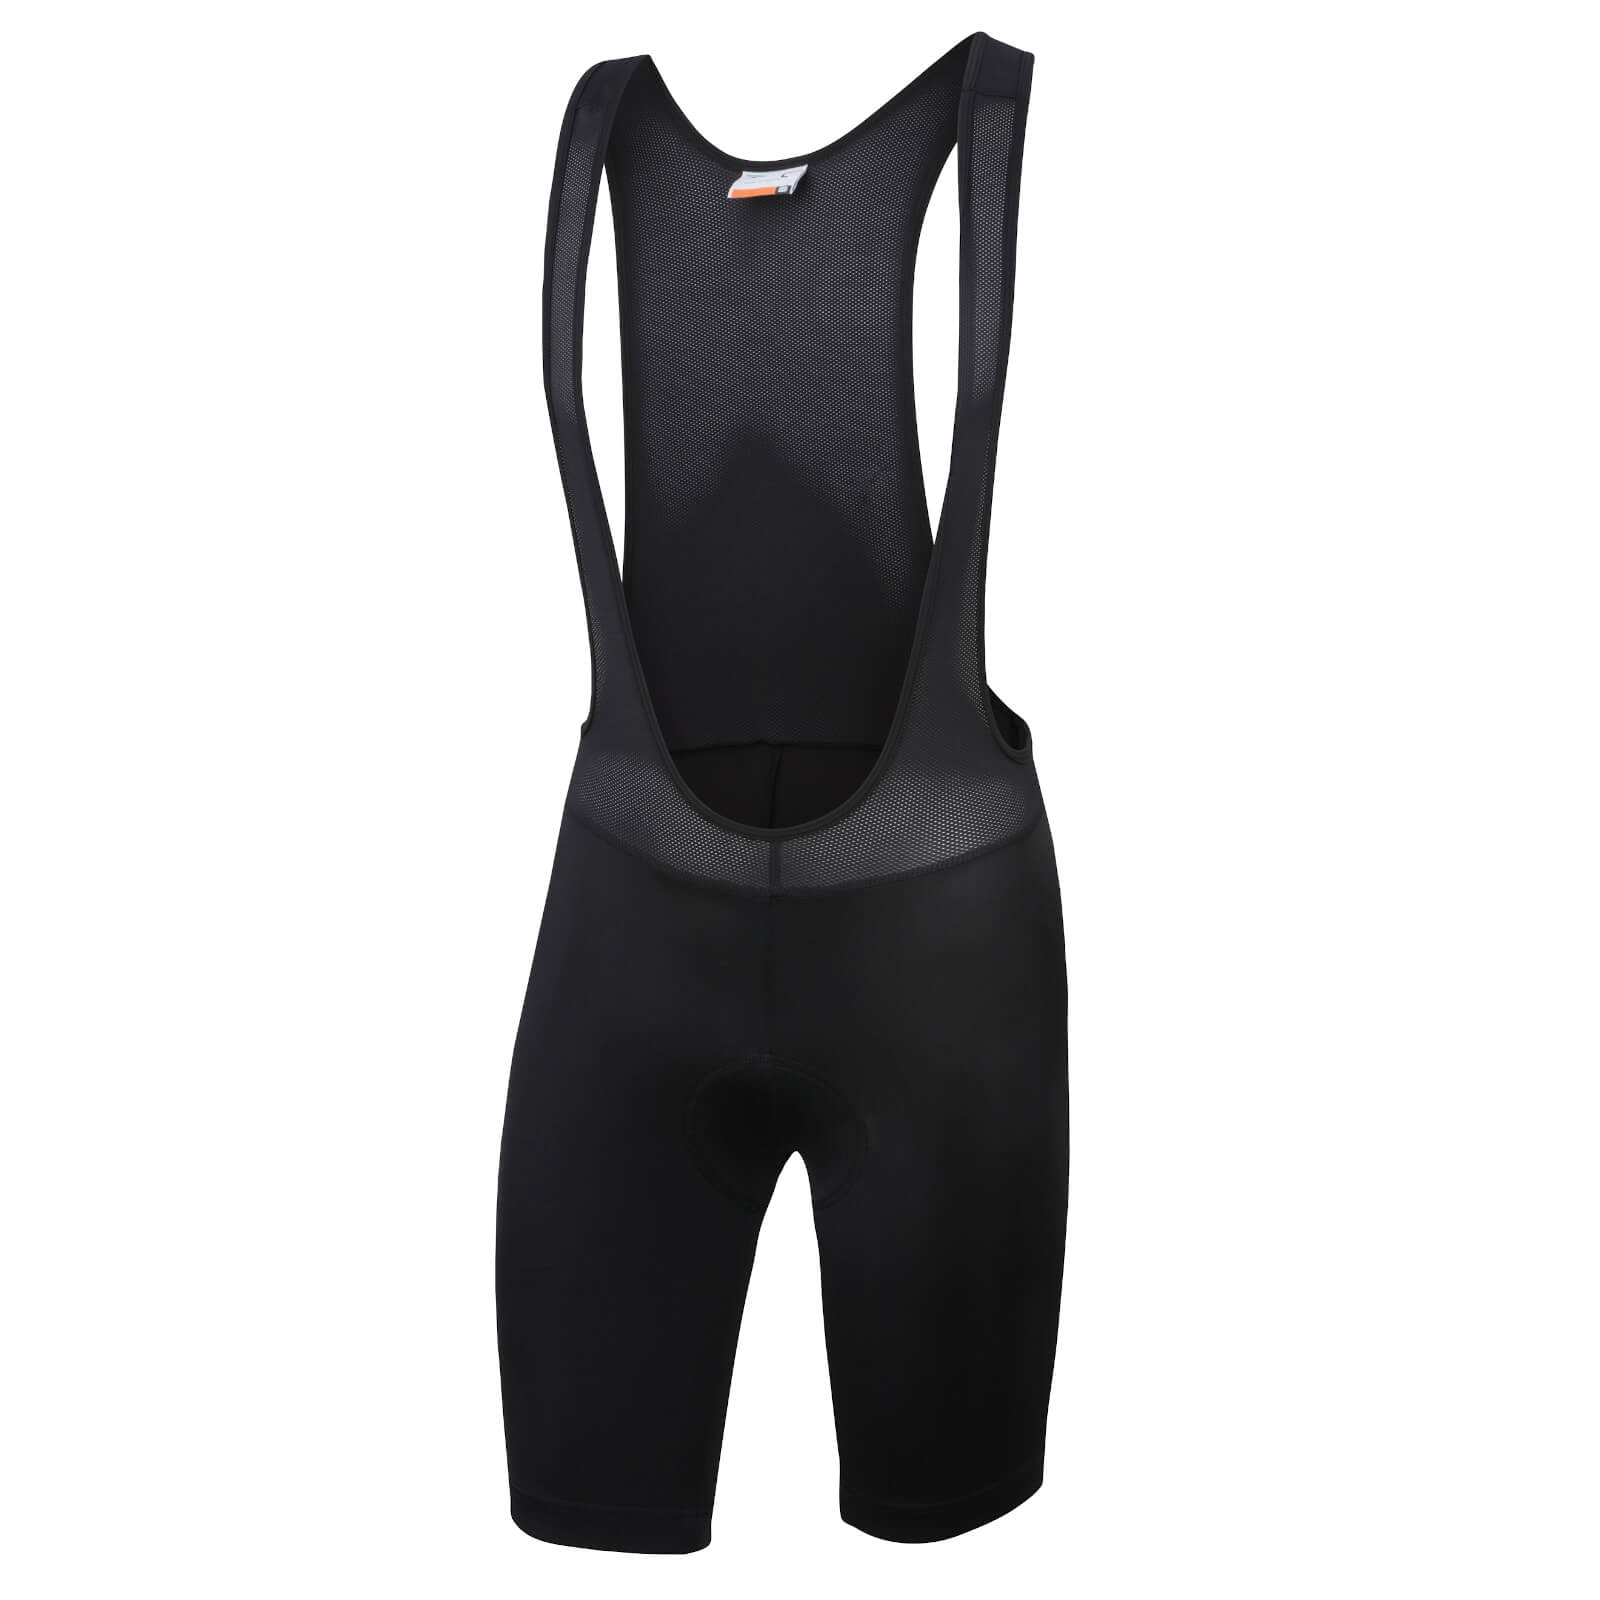 Sportful Vuelta Bib Shorts - XL